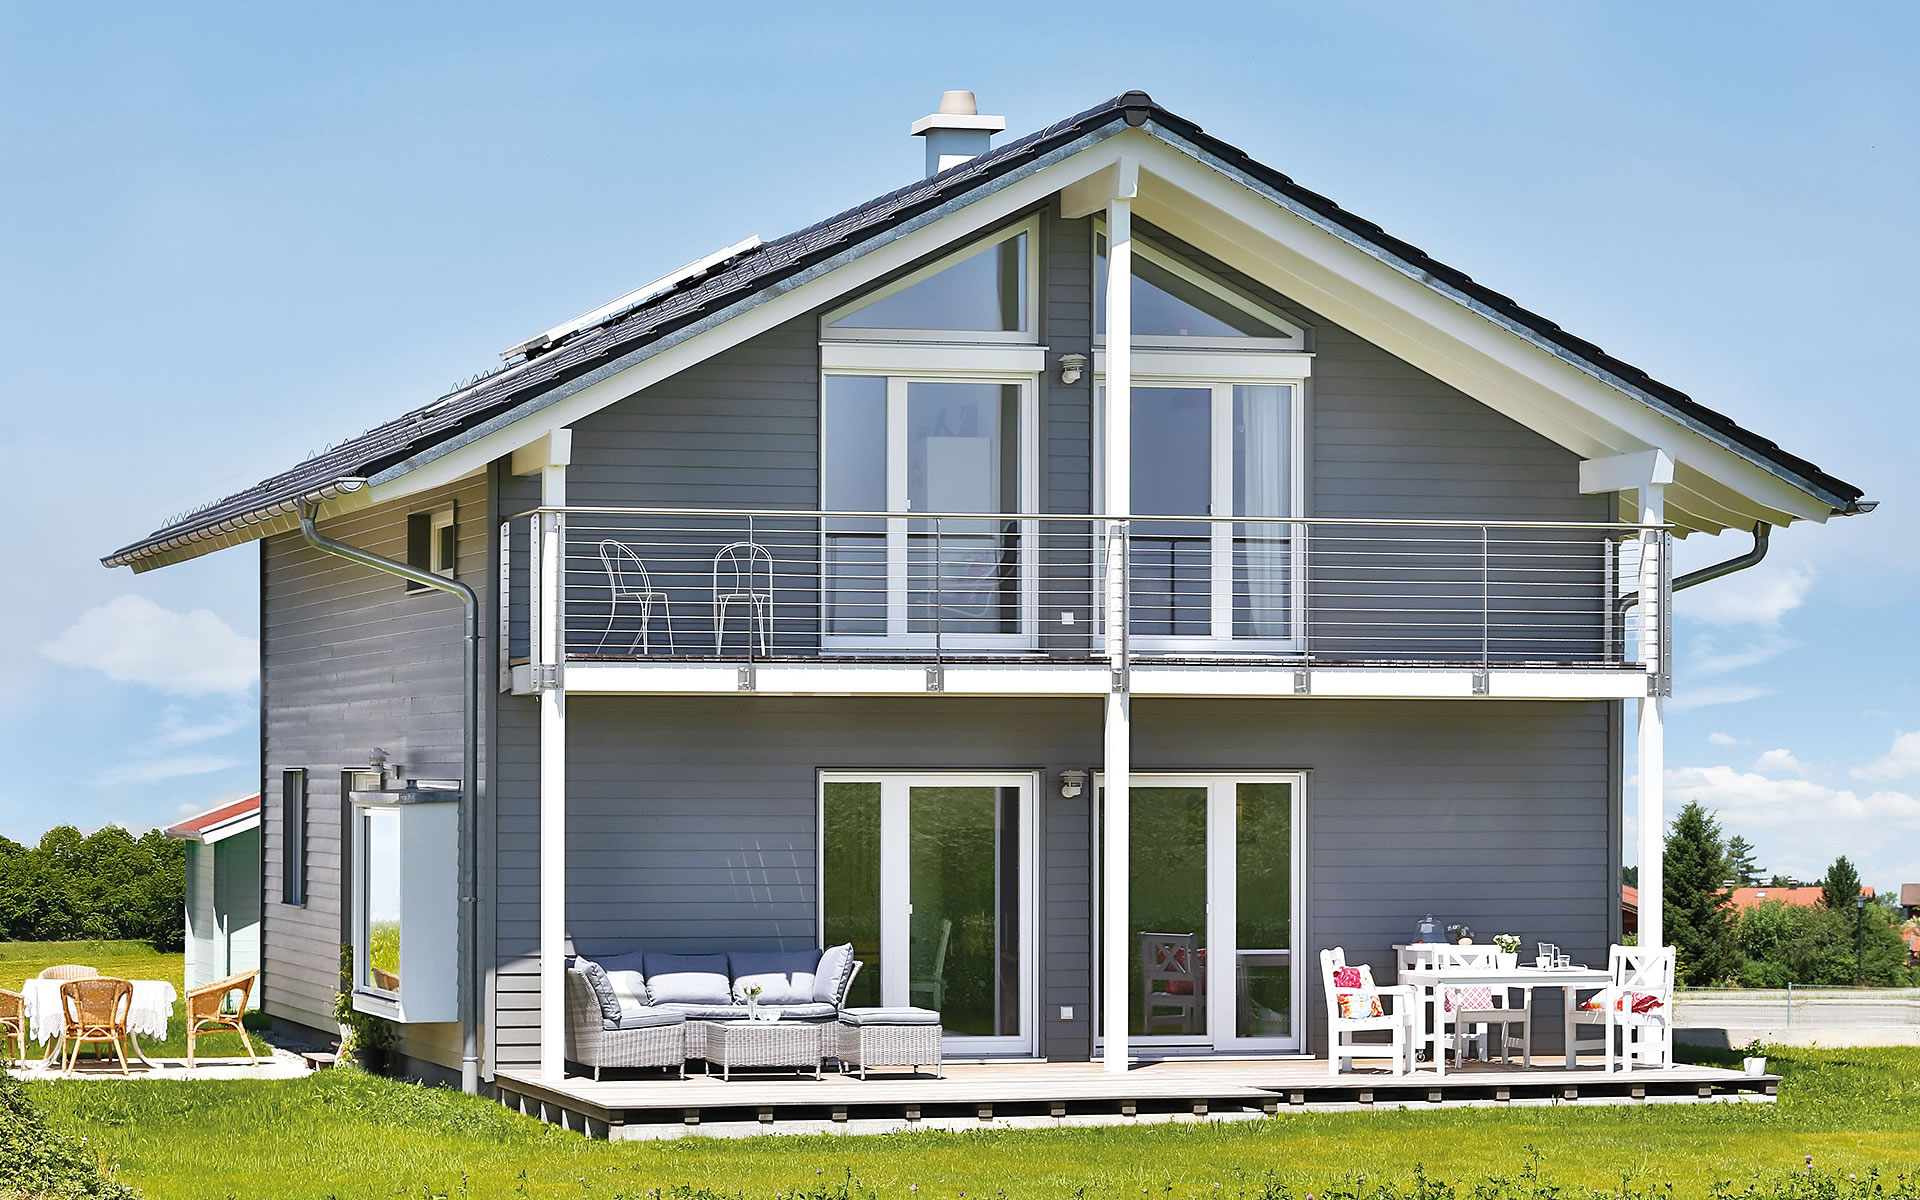 Lautrach von Regnauer Hausbau GmbH & Co. KG